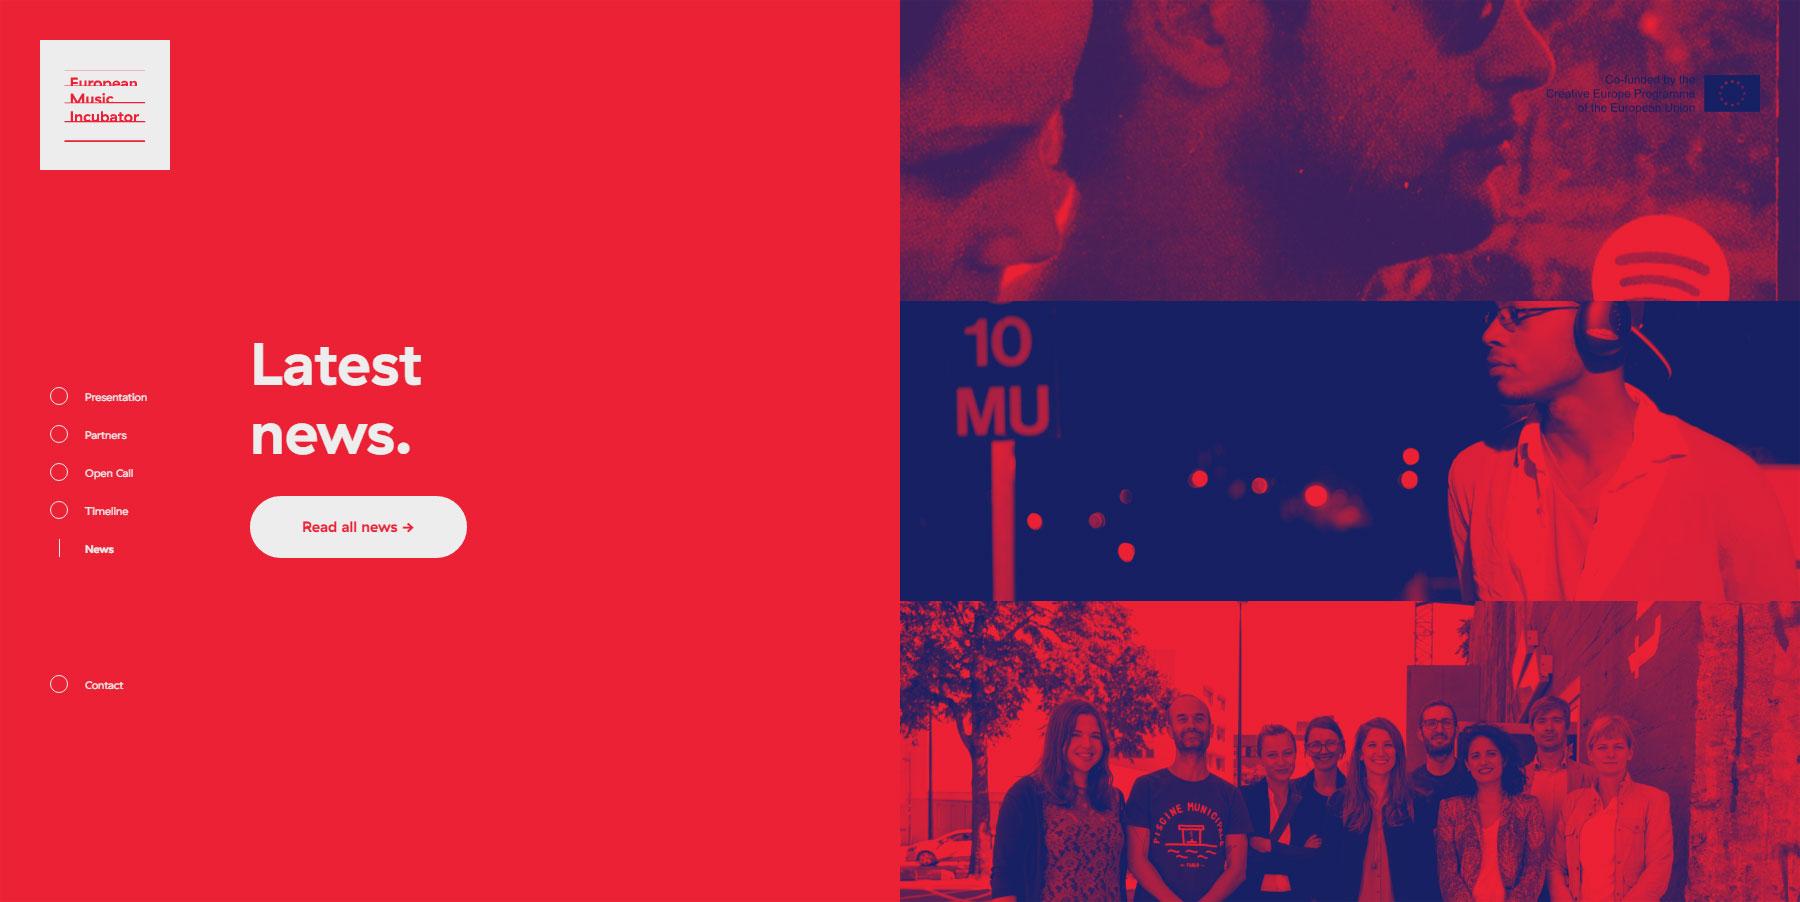 European Music Incubator - Website of the Month